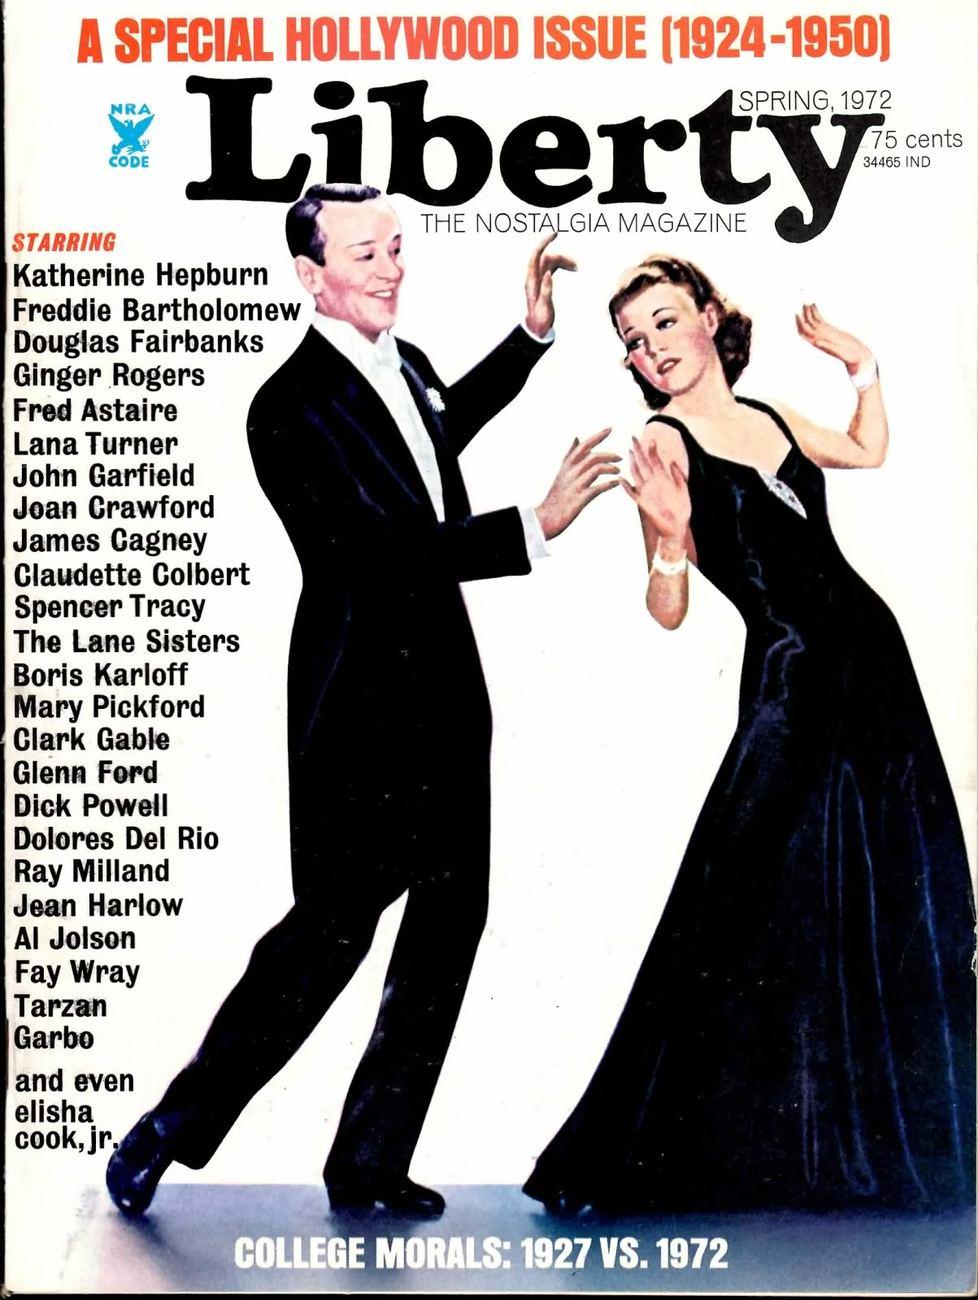 LIBERTY THE NOSTALGIA MAGAZINE NO 04 SPRING 1972 VF RAR